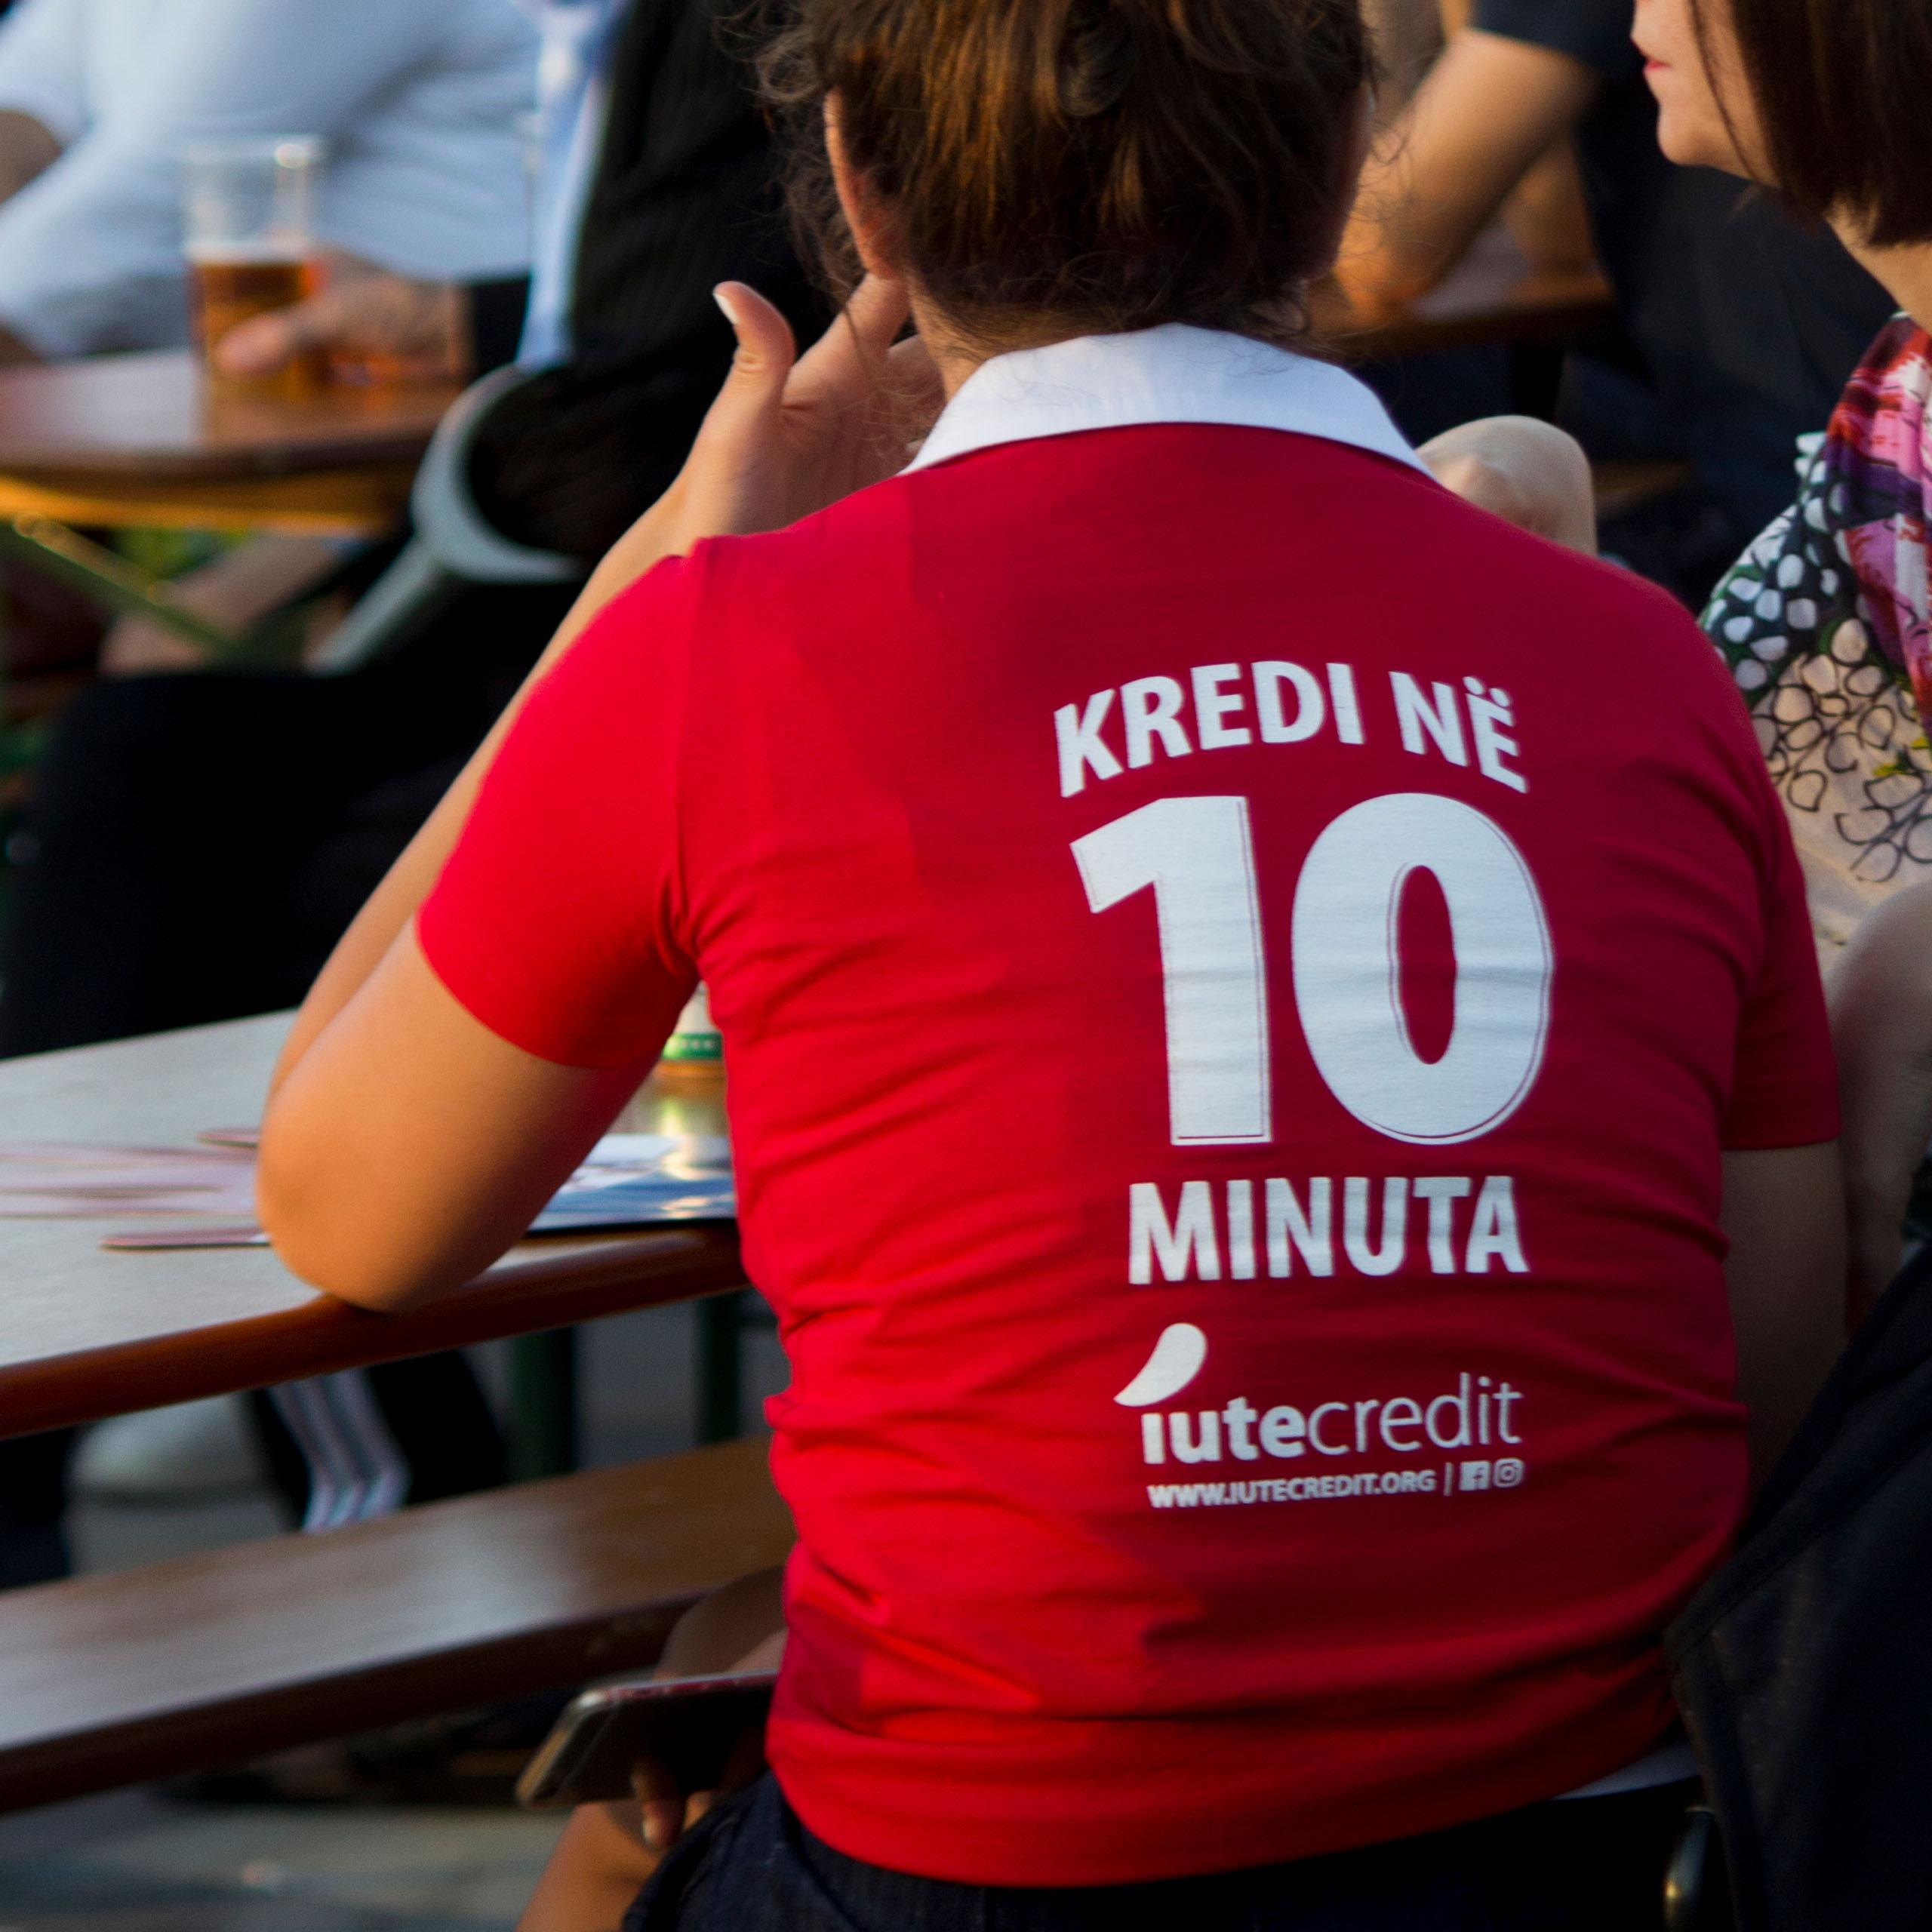 Iute Credit Project Img 1 - Vatra Agency / Founder & CEO Gerton Bejo